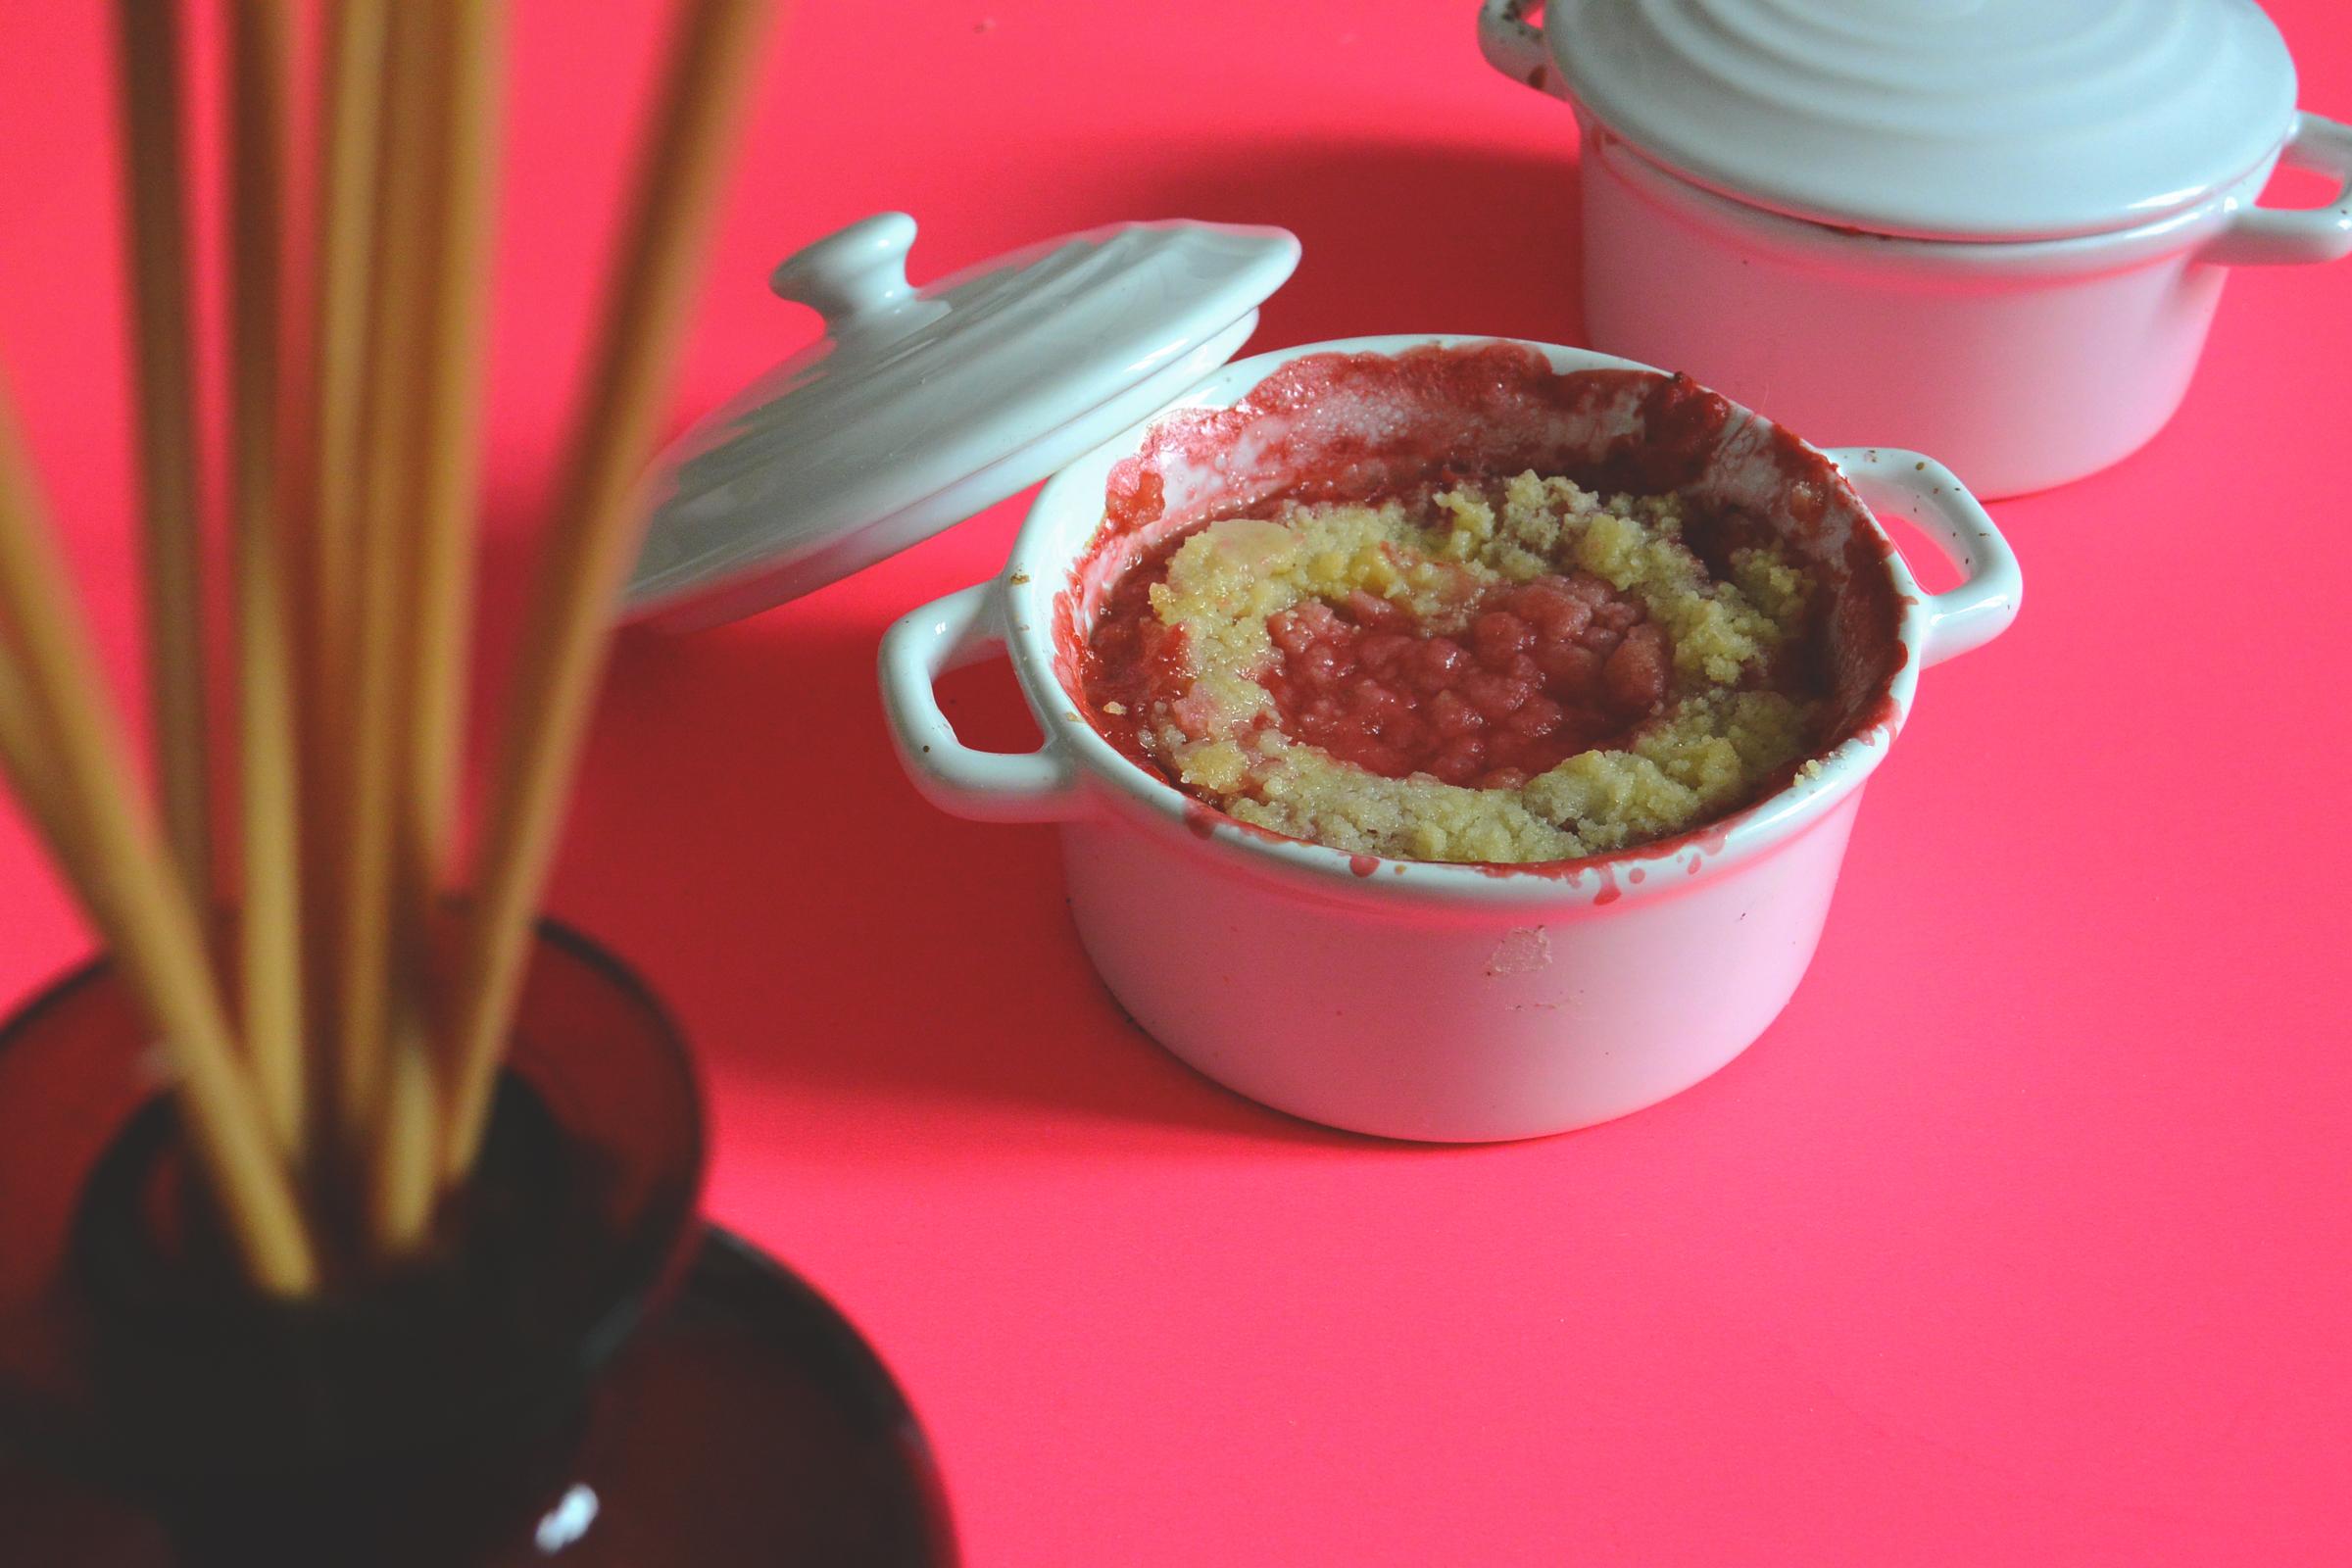 La vie en rose: Crumble fraise rhubarbe